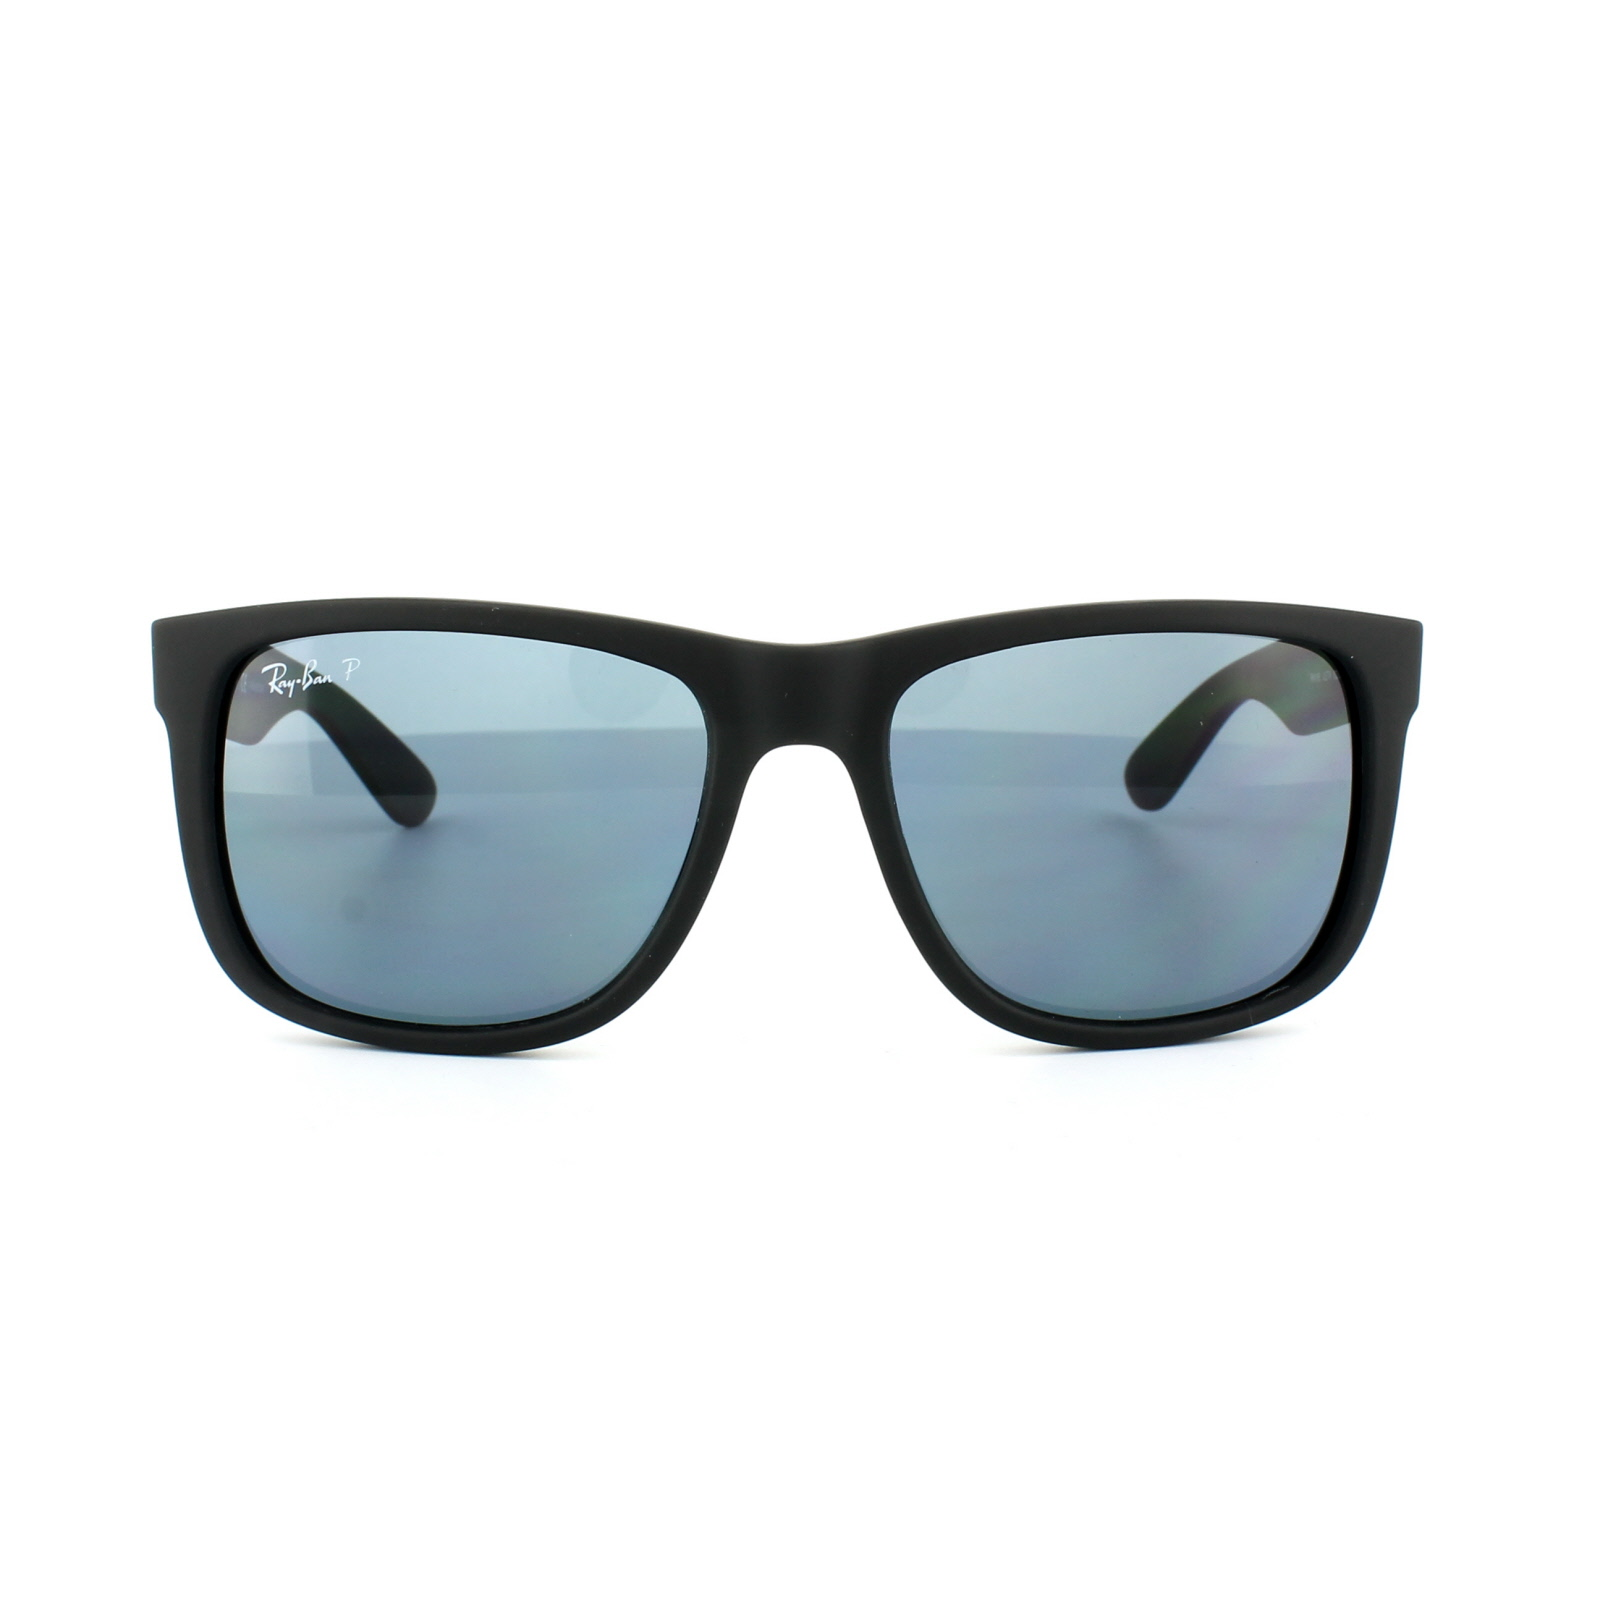 d9f1ecb33276 Sentinel Ray-Ban Sunglasses Justin 4165 622 2V Black Blue Polarized Large  55mm